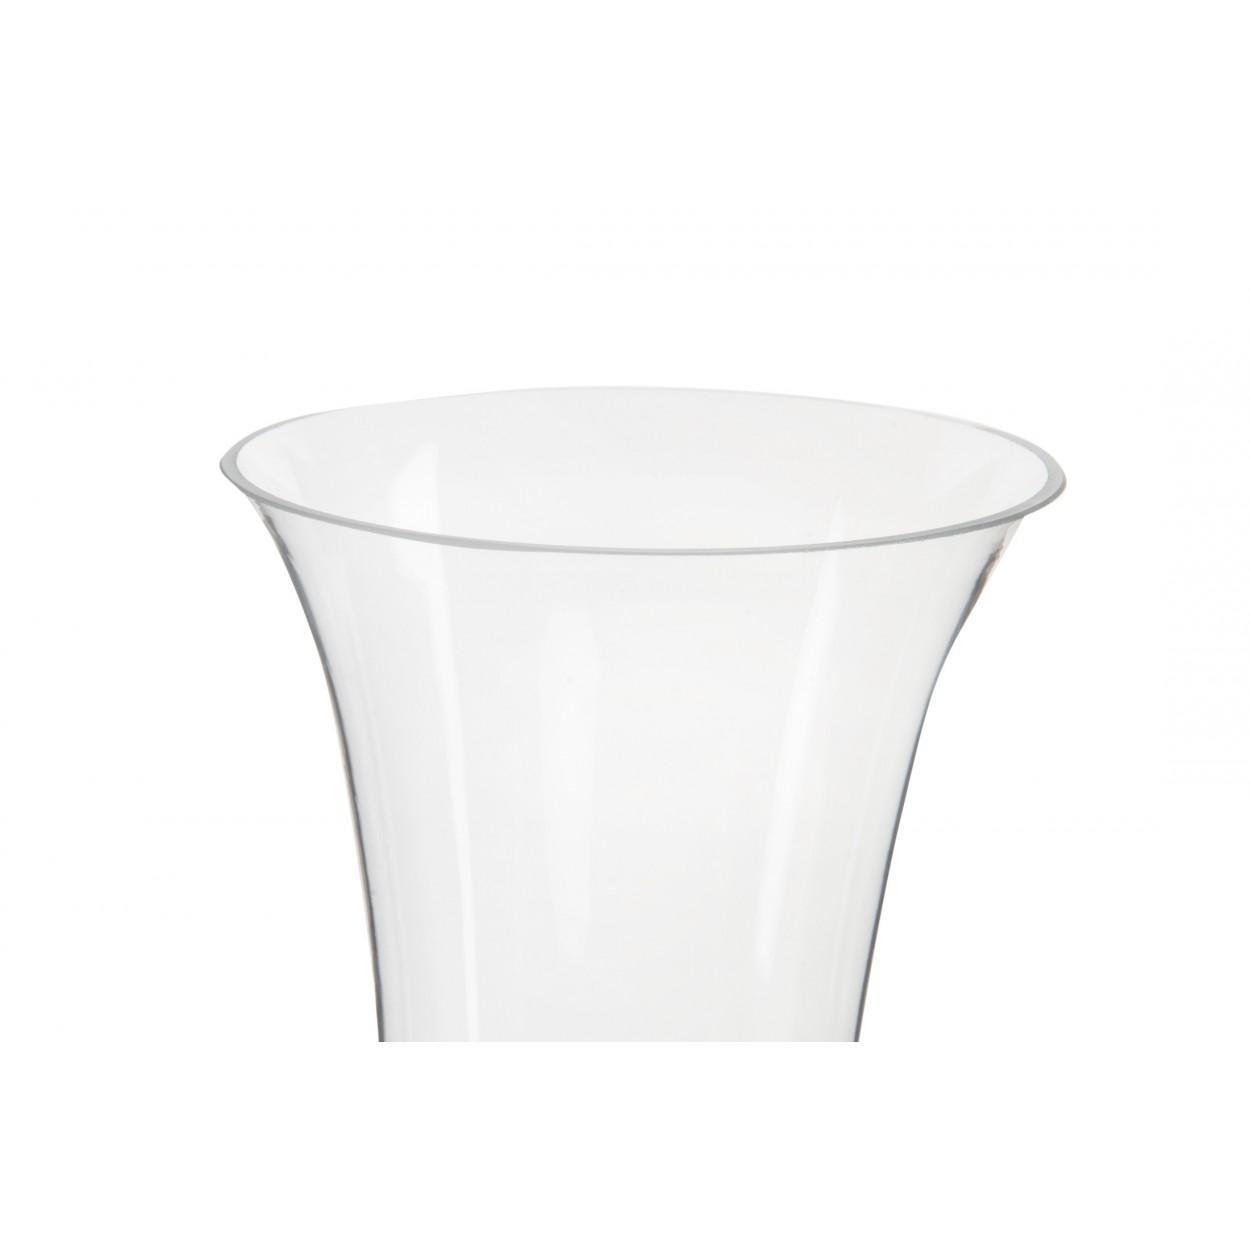 Hogar y m s jarr n de cristal para decoraci n hogar y m s for Jarron cristal decoracion